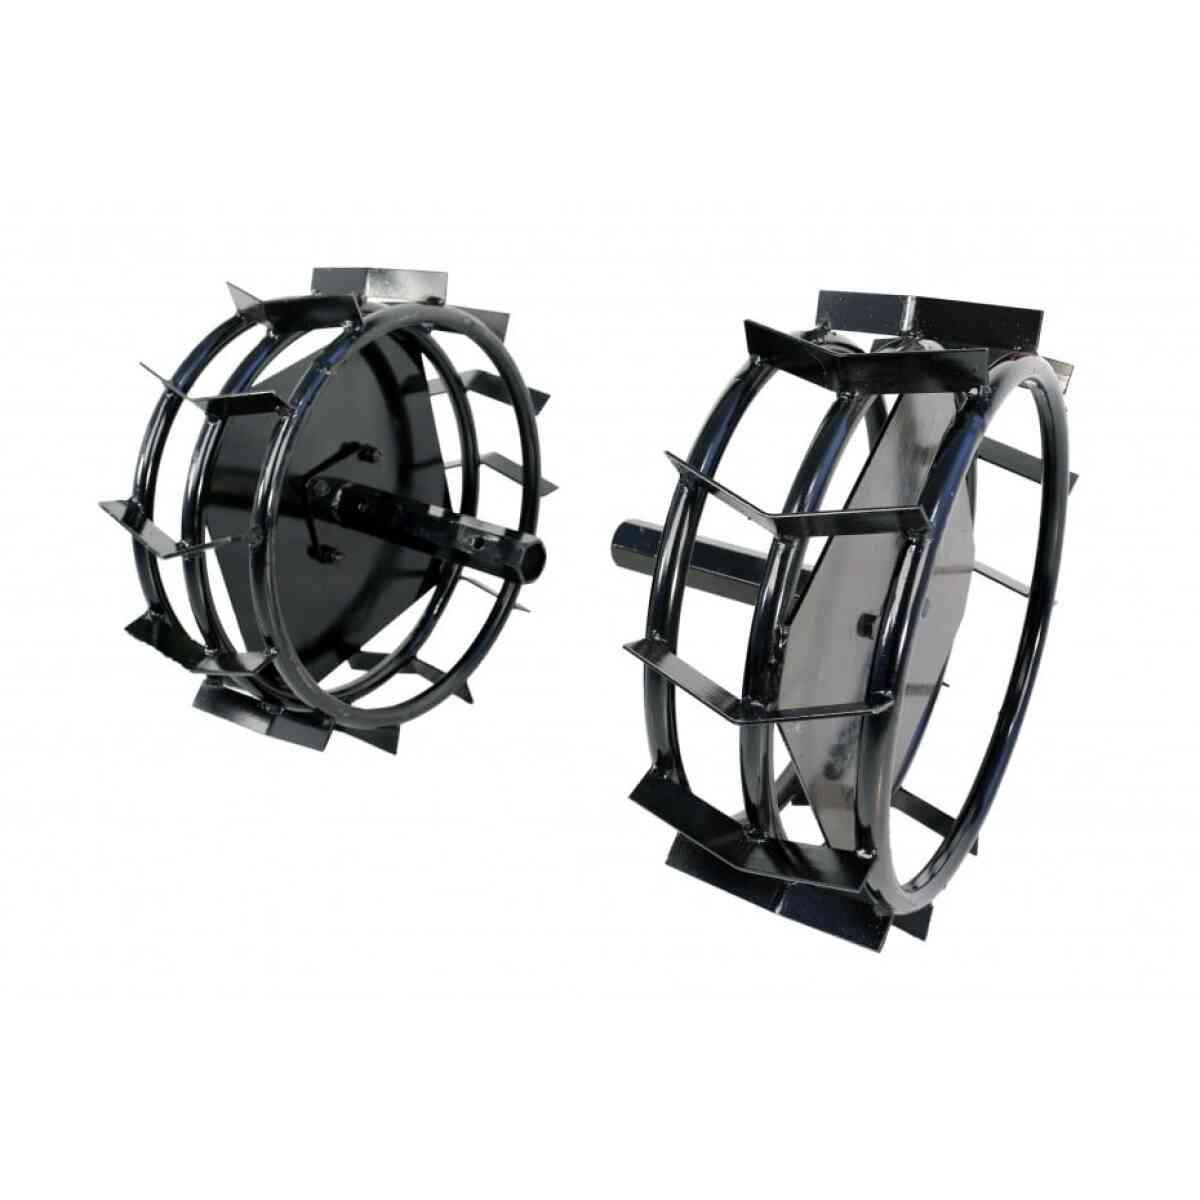 set 2 buc roti metalice cu manicot motocultor lc90 lc1200 22